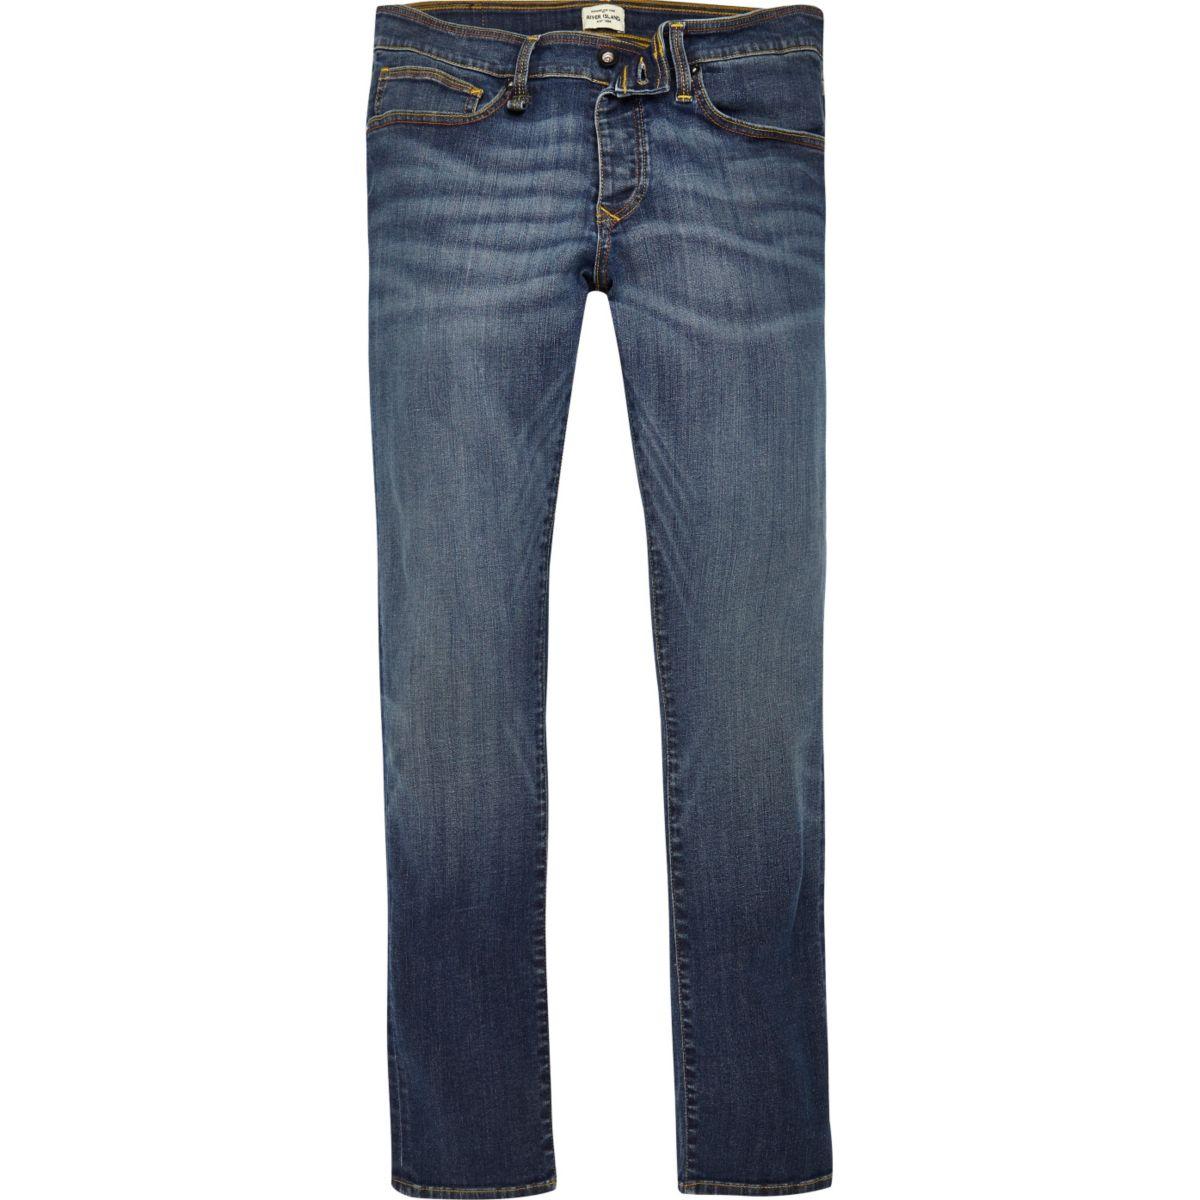 Blauwe wash RI Flex Danny superskinny jeans